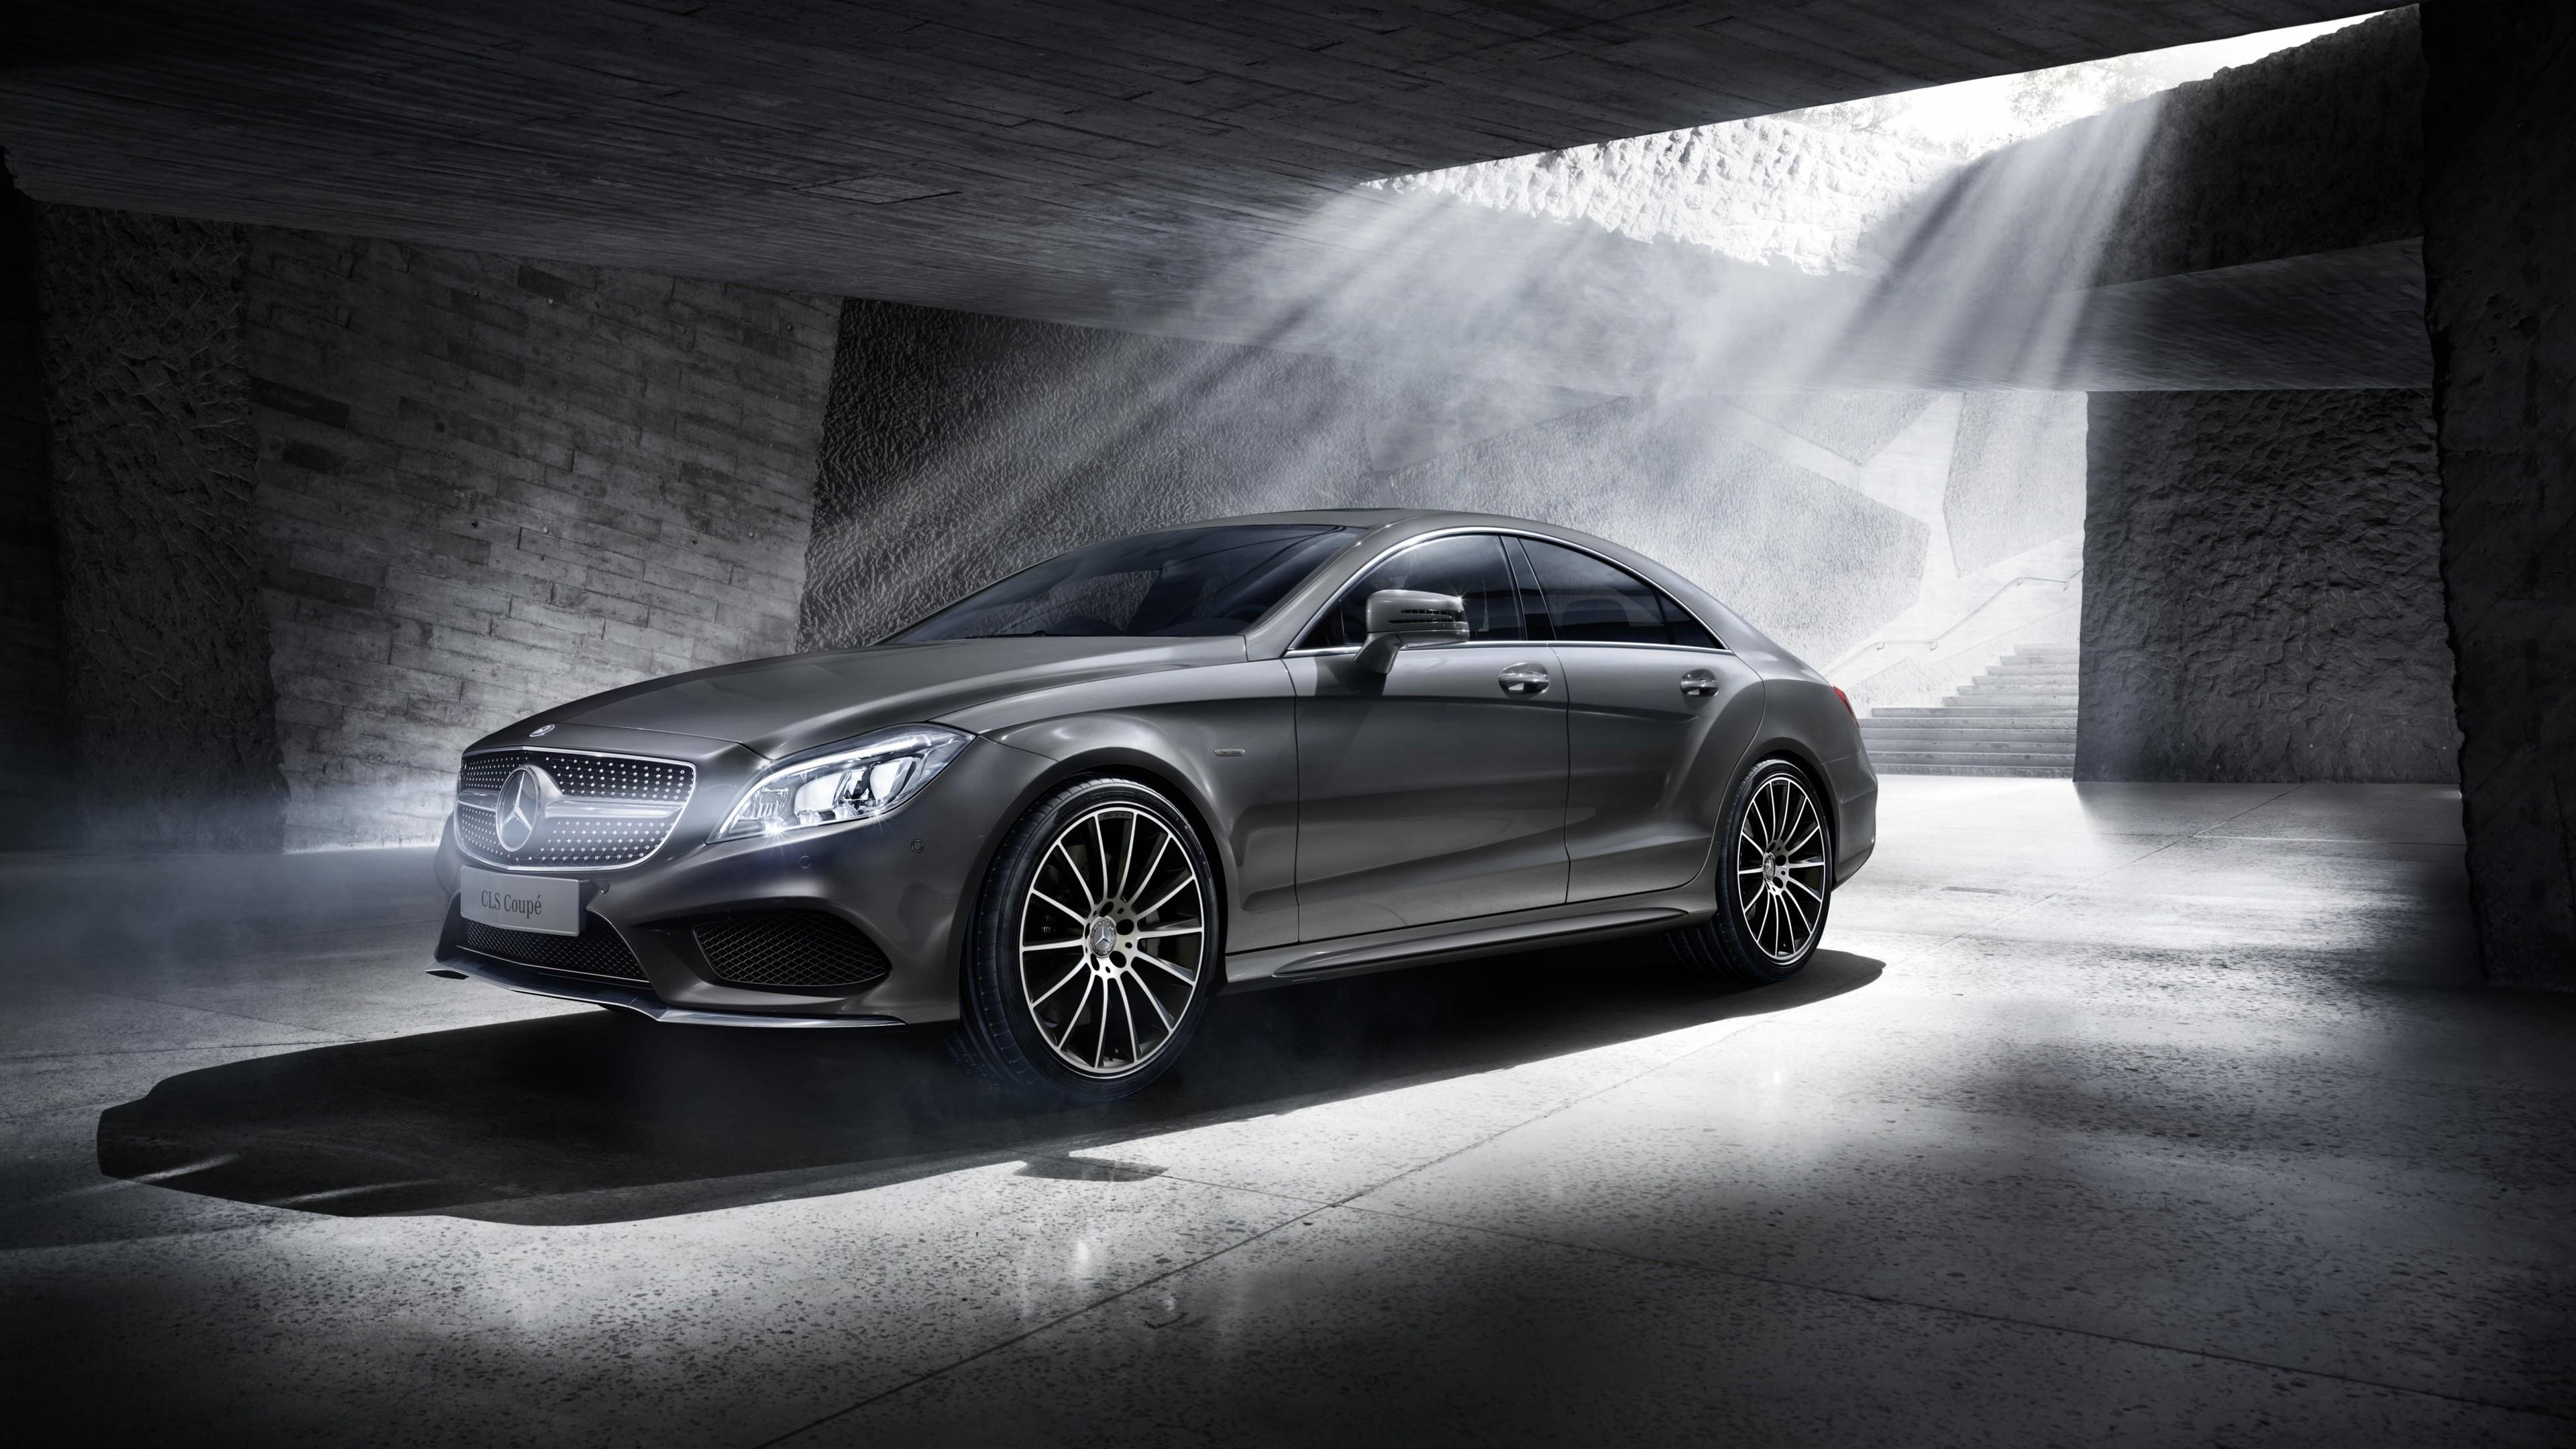 2016 Mercedes Benz CLS Coupe Final Edition Wallpaper HD 3840x2160